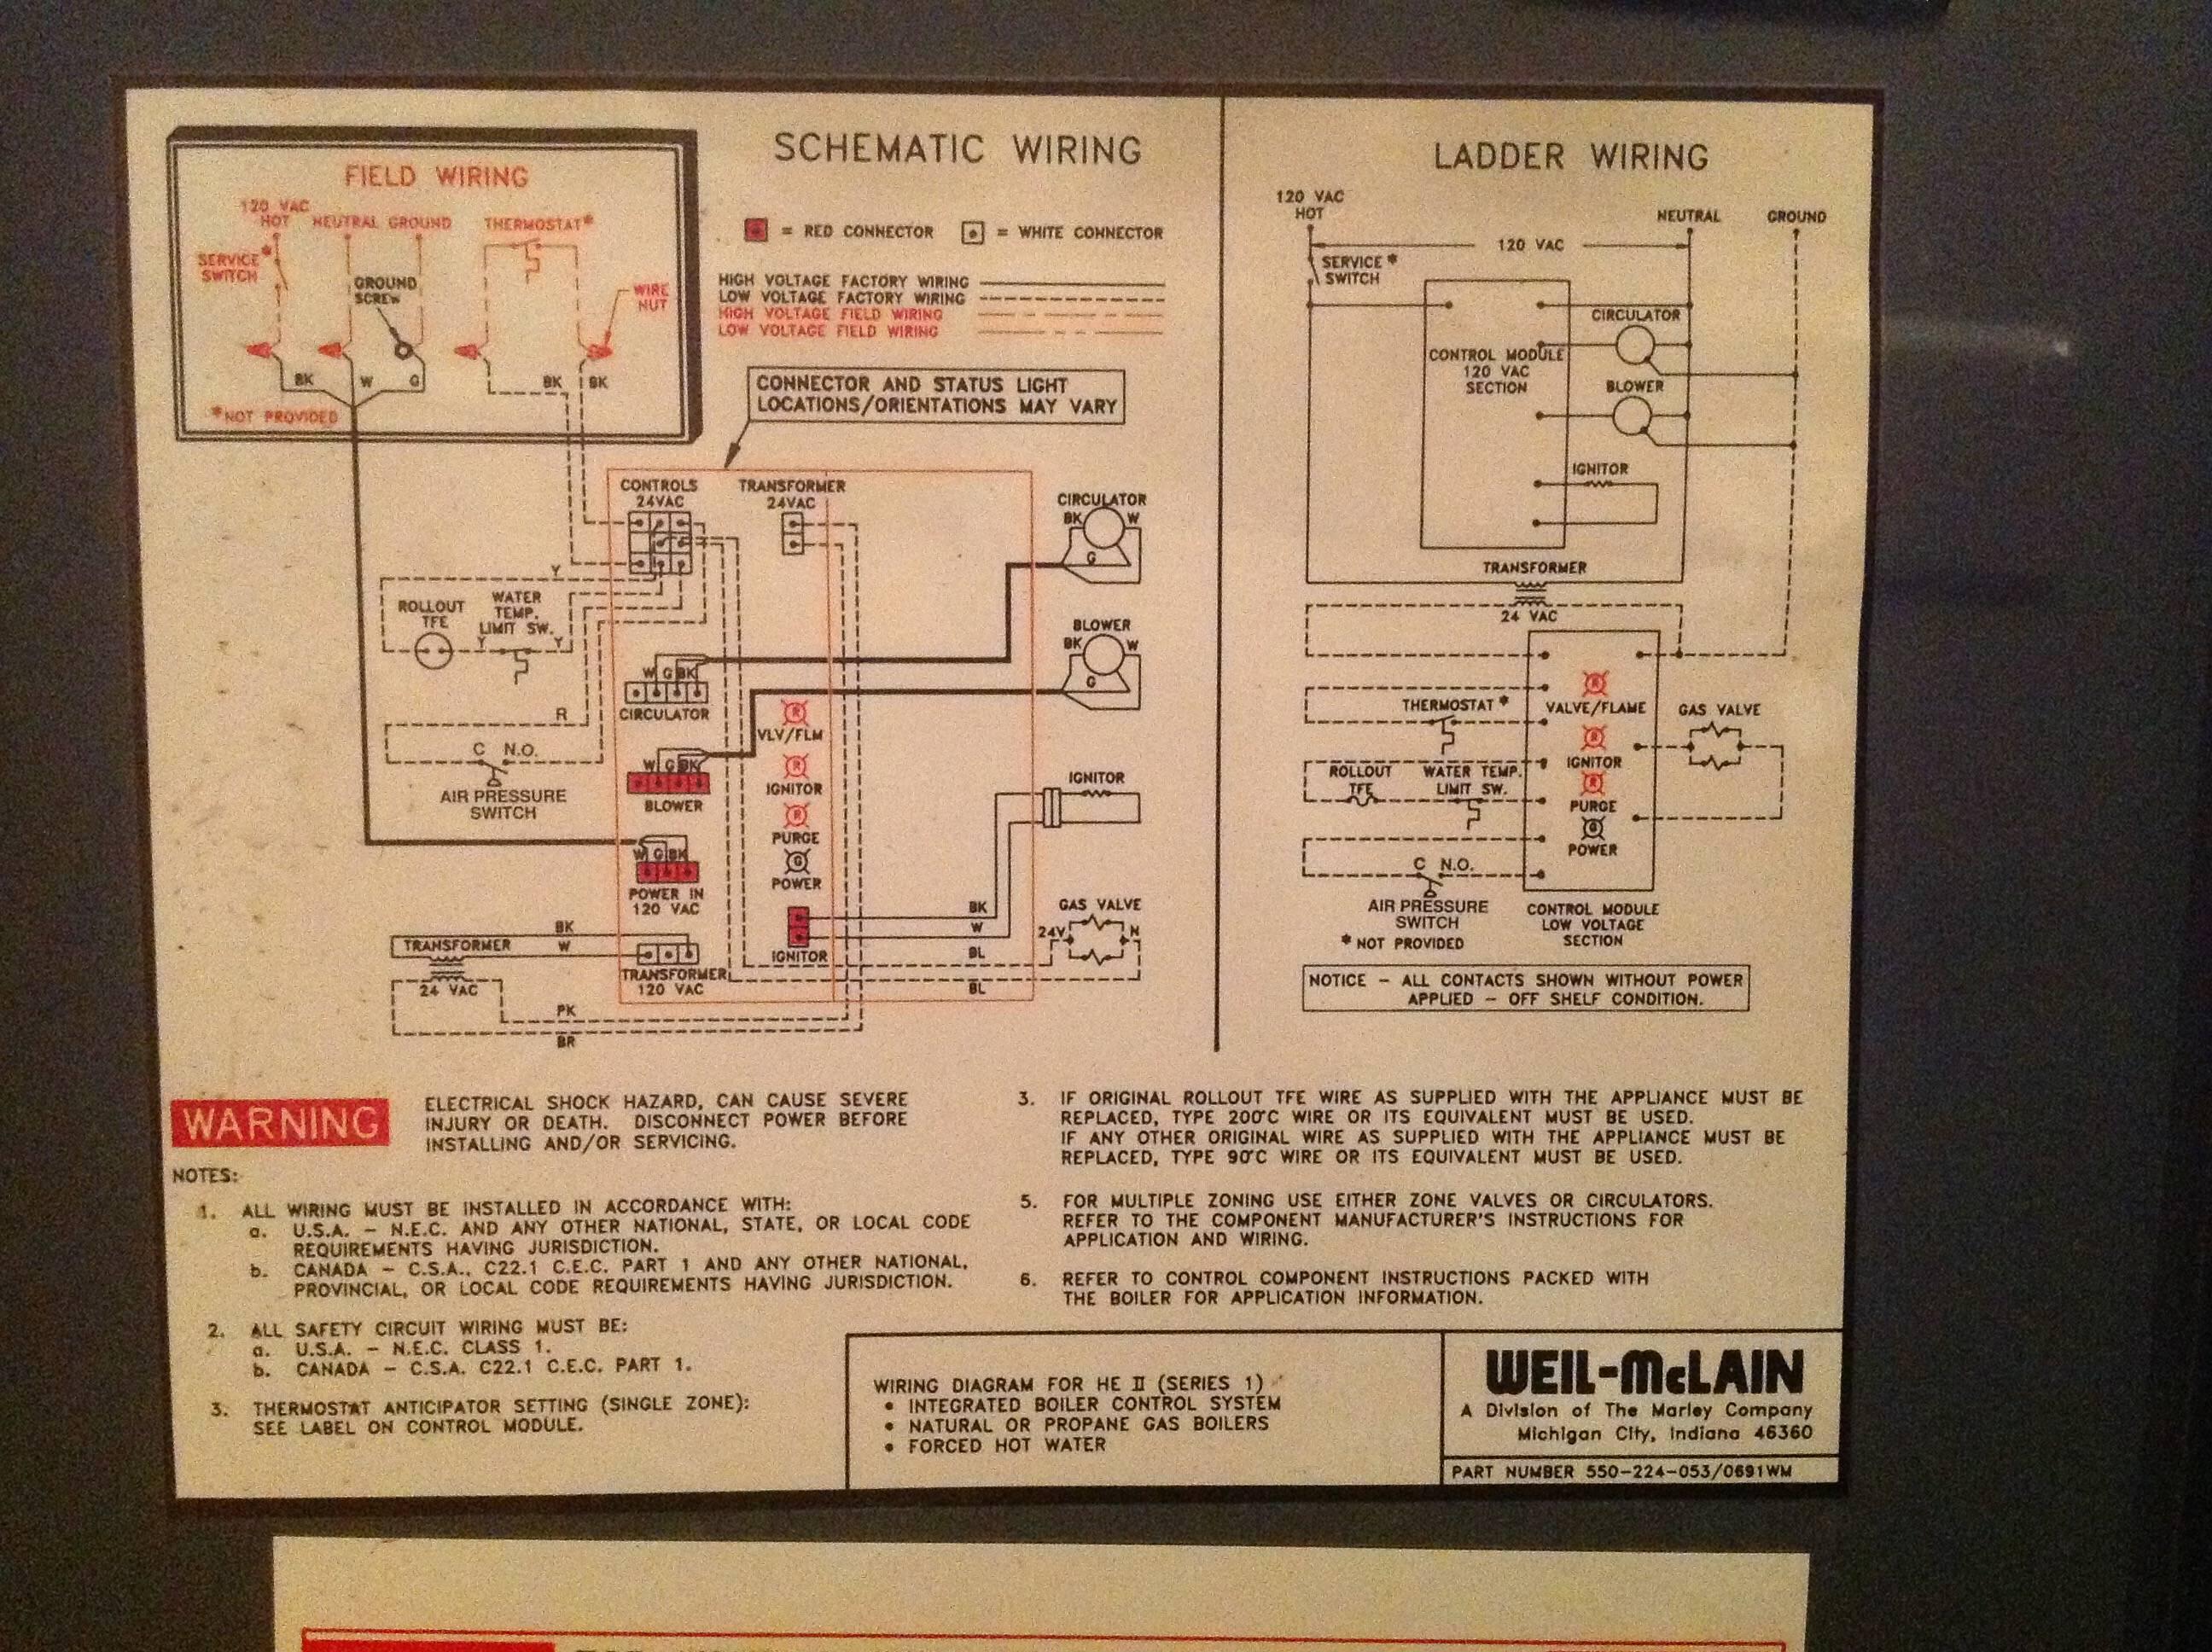 Hcmj0?resize=665%2C497&ssl=1 taco zone valve 555 102 wiring diagram wiring diagram taco zone valve 555 102 wiring diagram at eliteediting.co